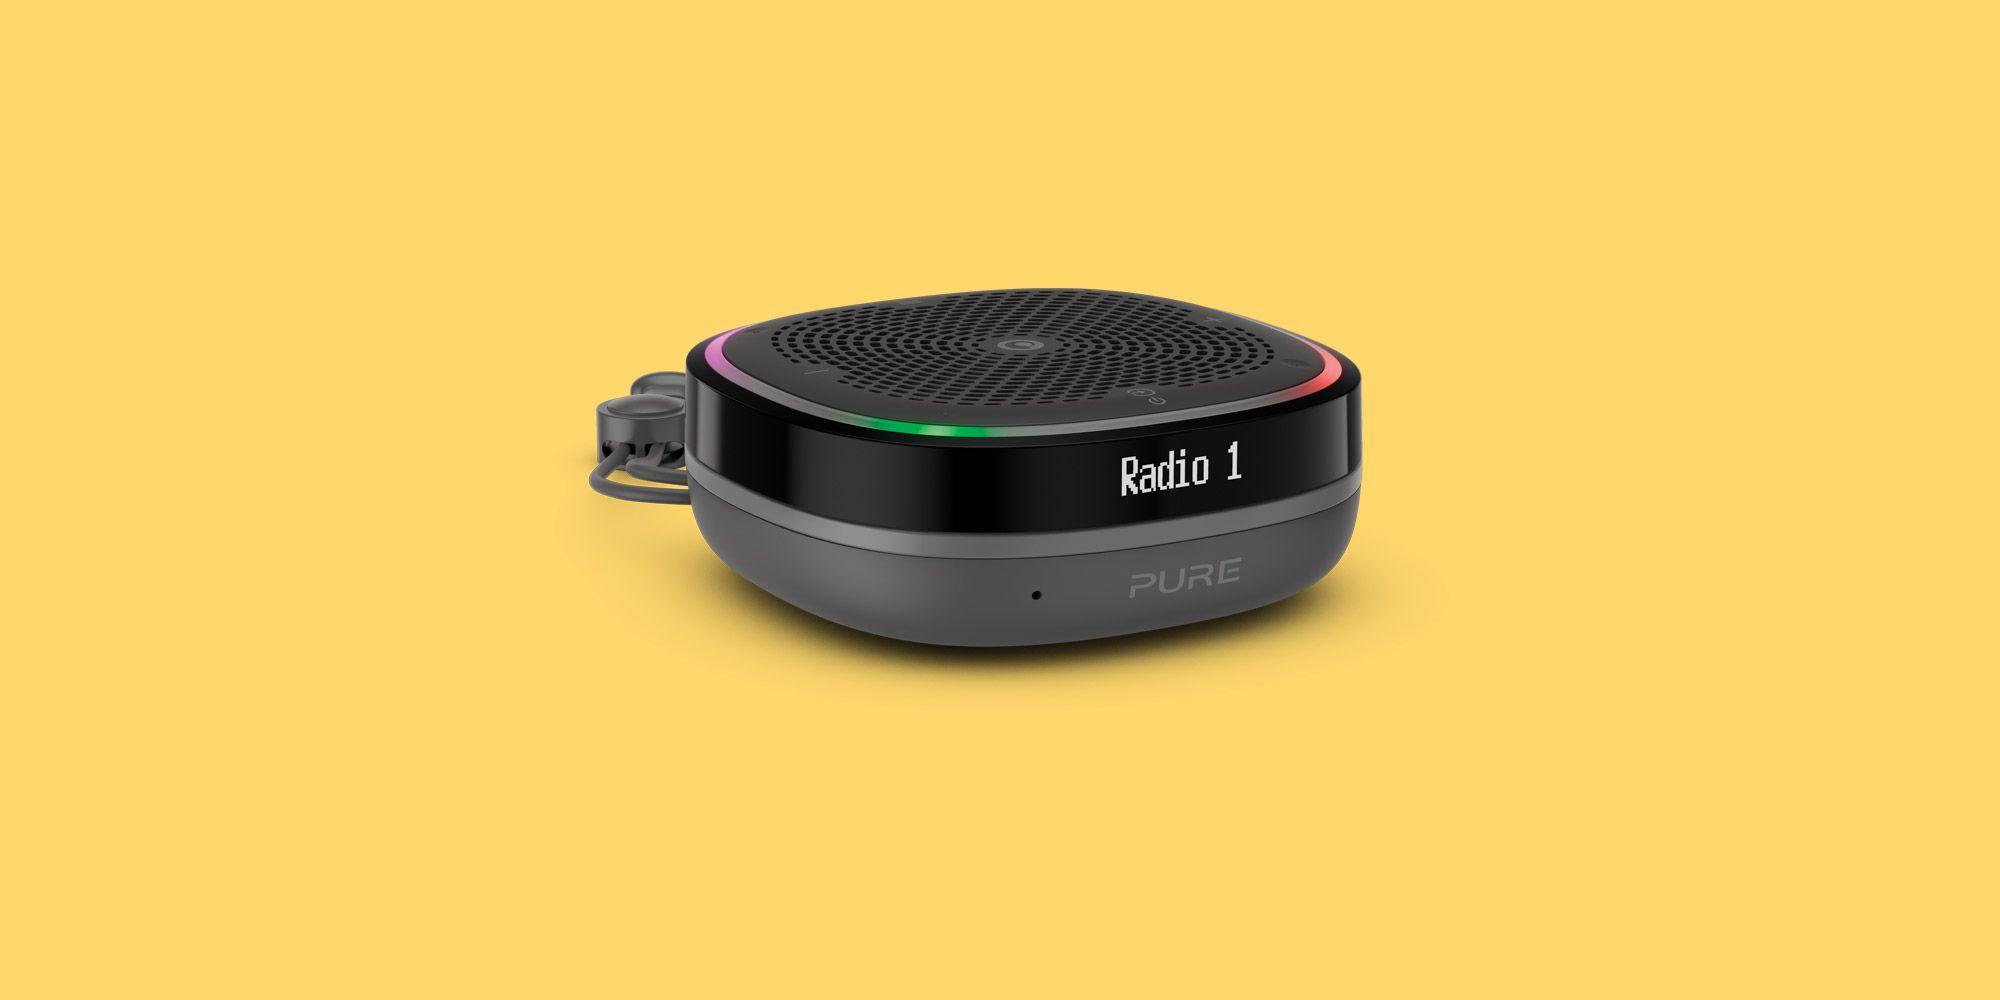 pure streamr bluetooth speaker and dab radio with amazon alexa